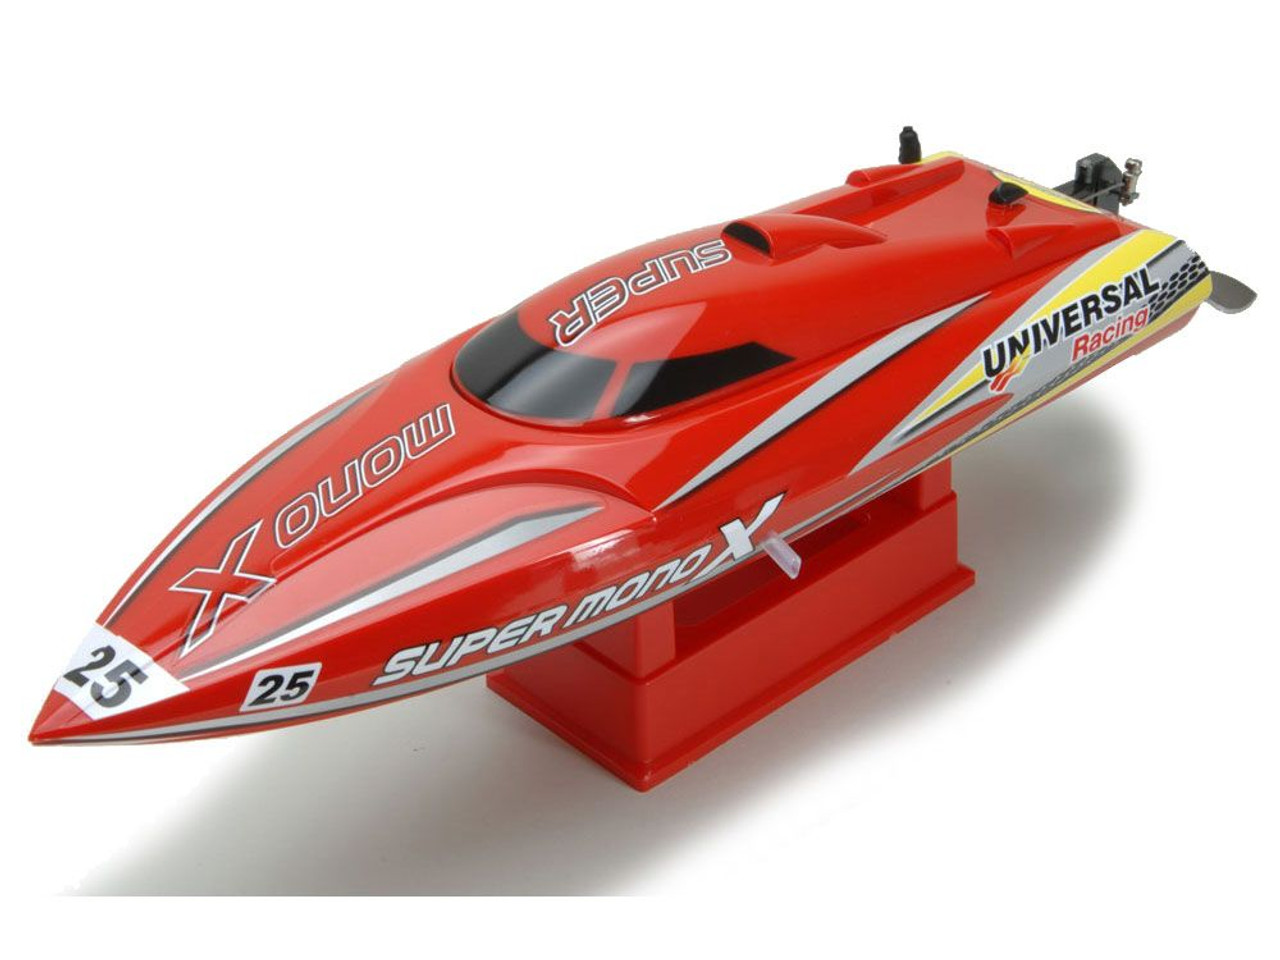 Super Mono X V2 RC Boat  Brushless Electric Joysway  8815 Ready to Run